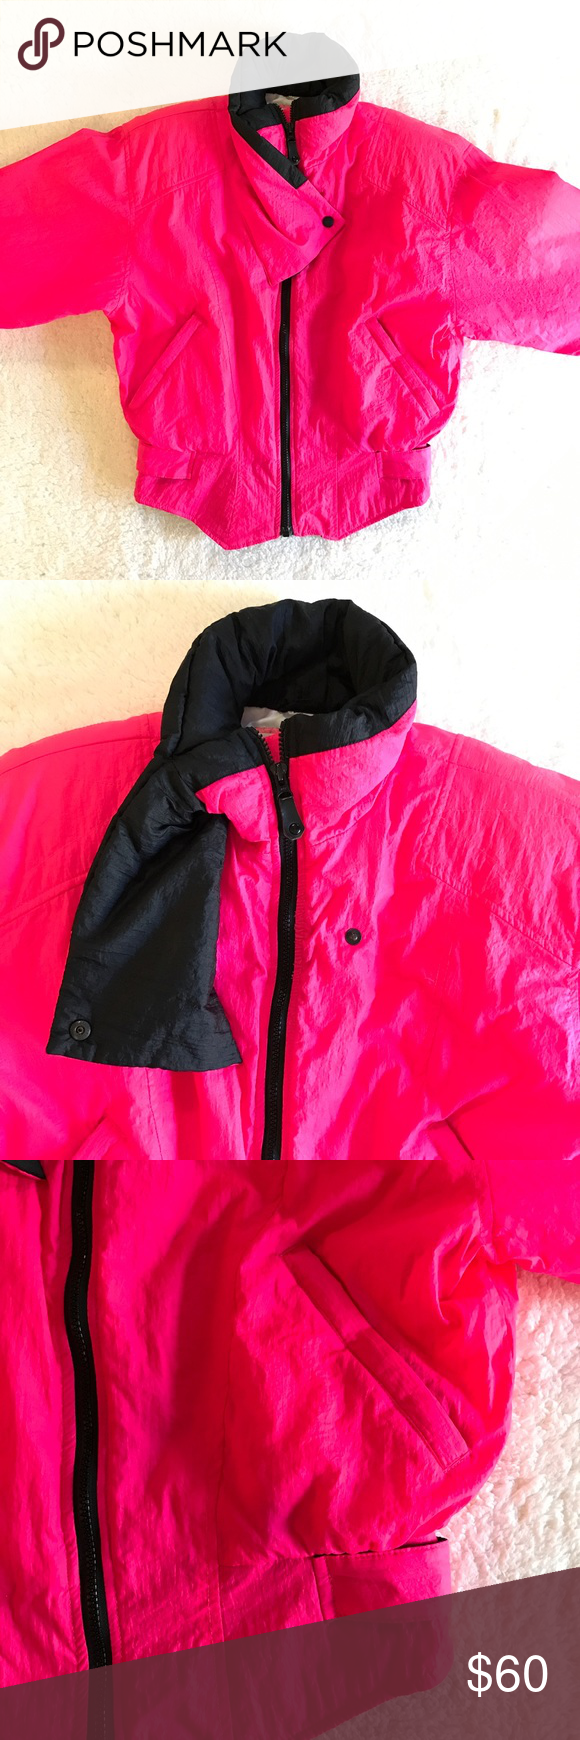 195e58c01d Shocking Pink with Black Detail   Zippers. No Flaws. 100% Nylon Shell 100%  Polyester Lining. Obermeyer Jackets   Coats. 90 s Vintage Obermeyer Ski  Jacket ...